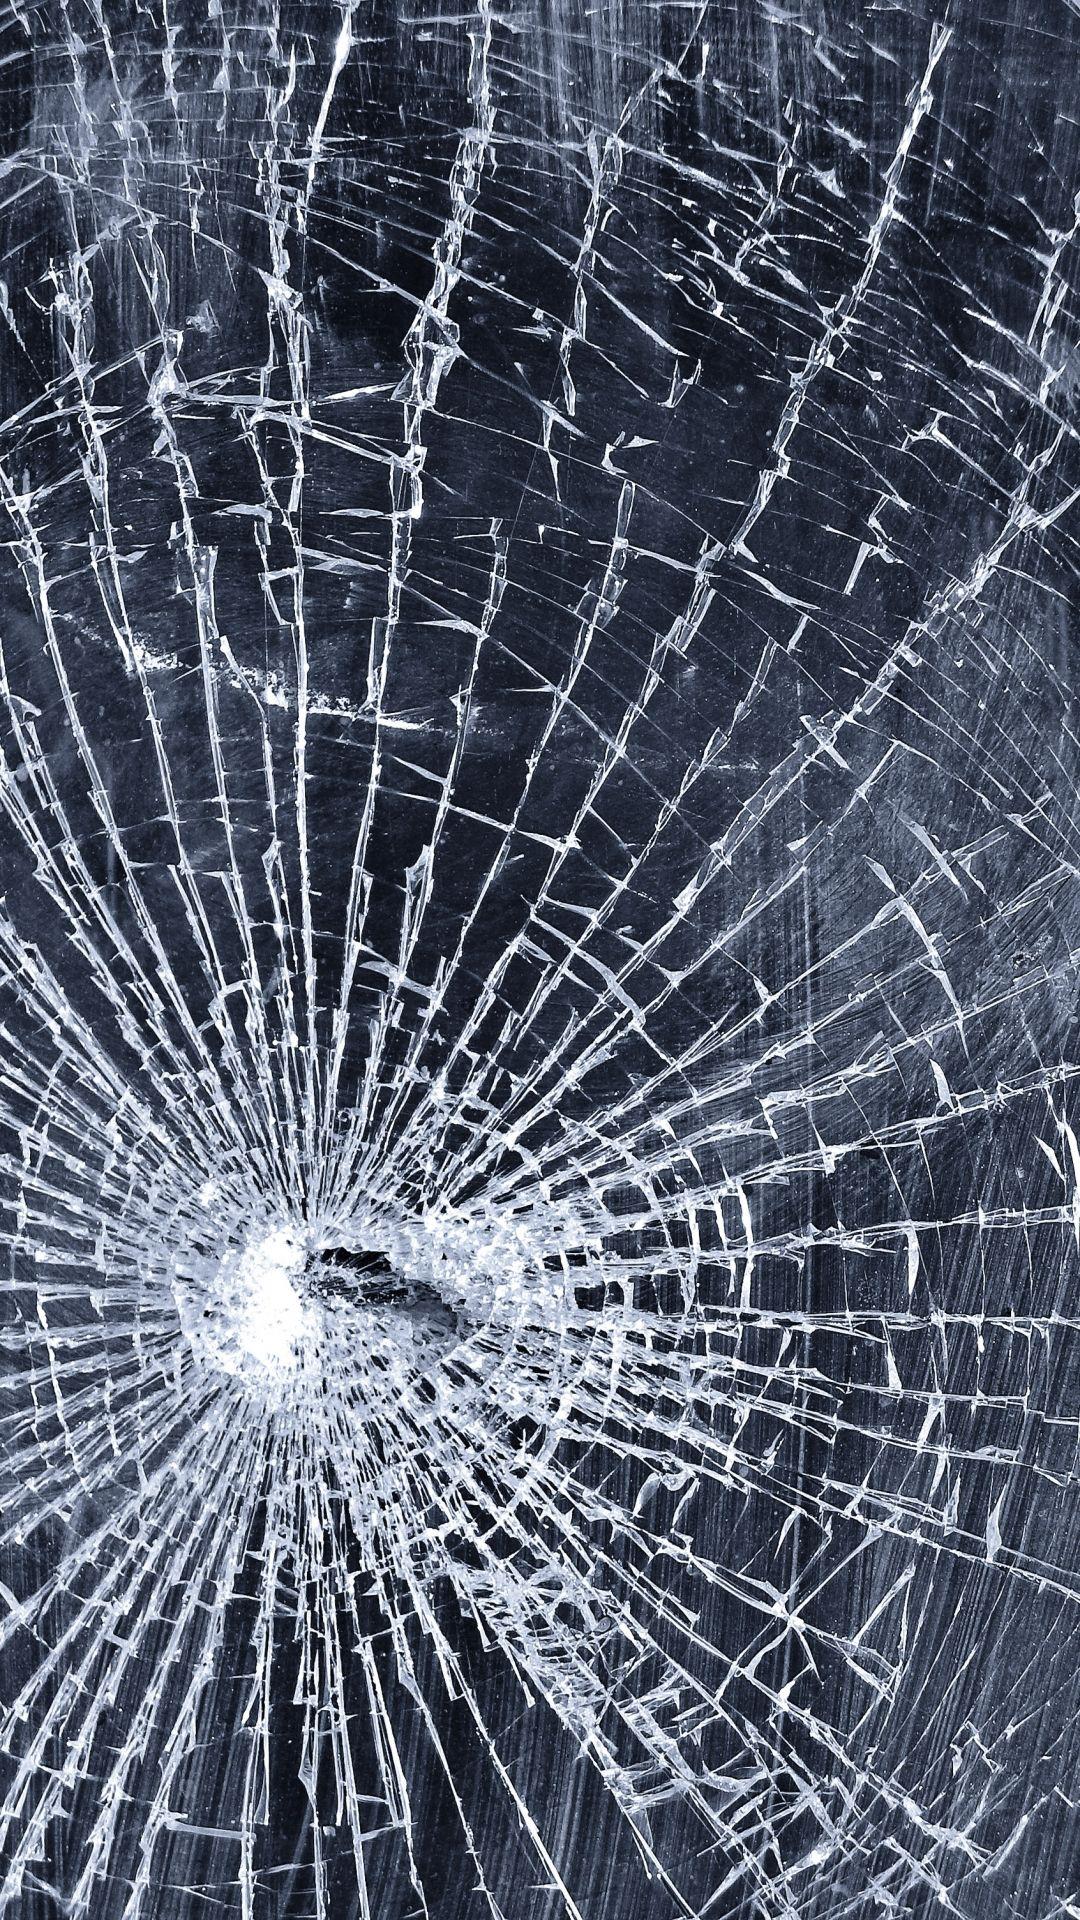 Realistic Cracked Screen Wallpaper Mobile Broken Screen Wallpaper Broken Glass Wallpaper Screen Wallpaper Hd